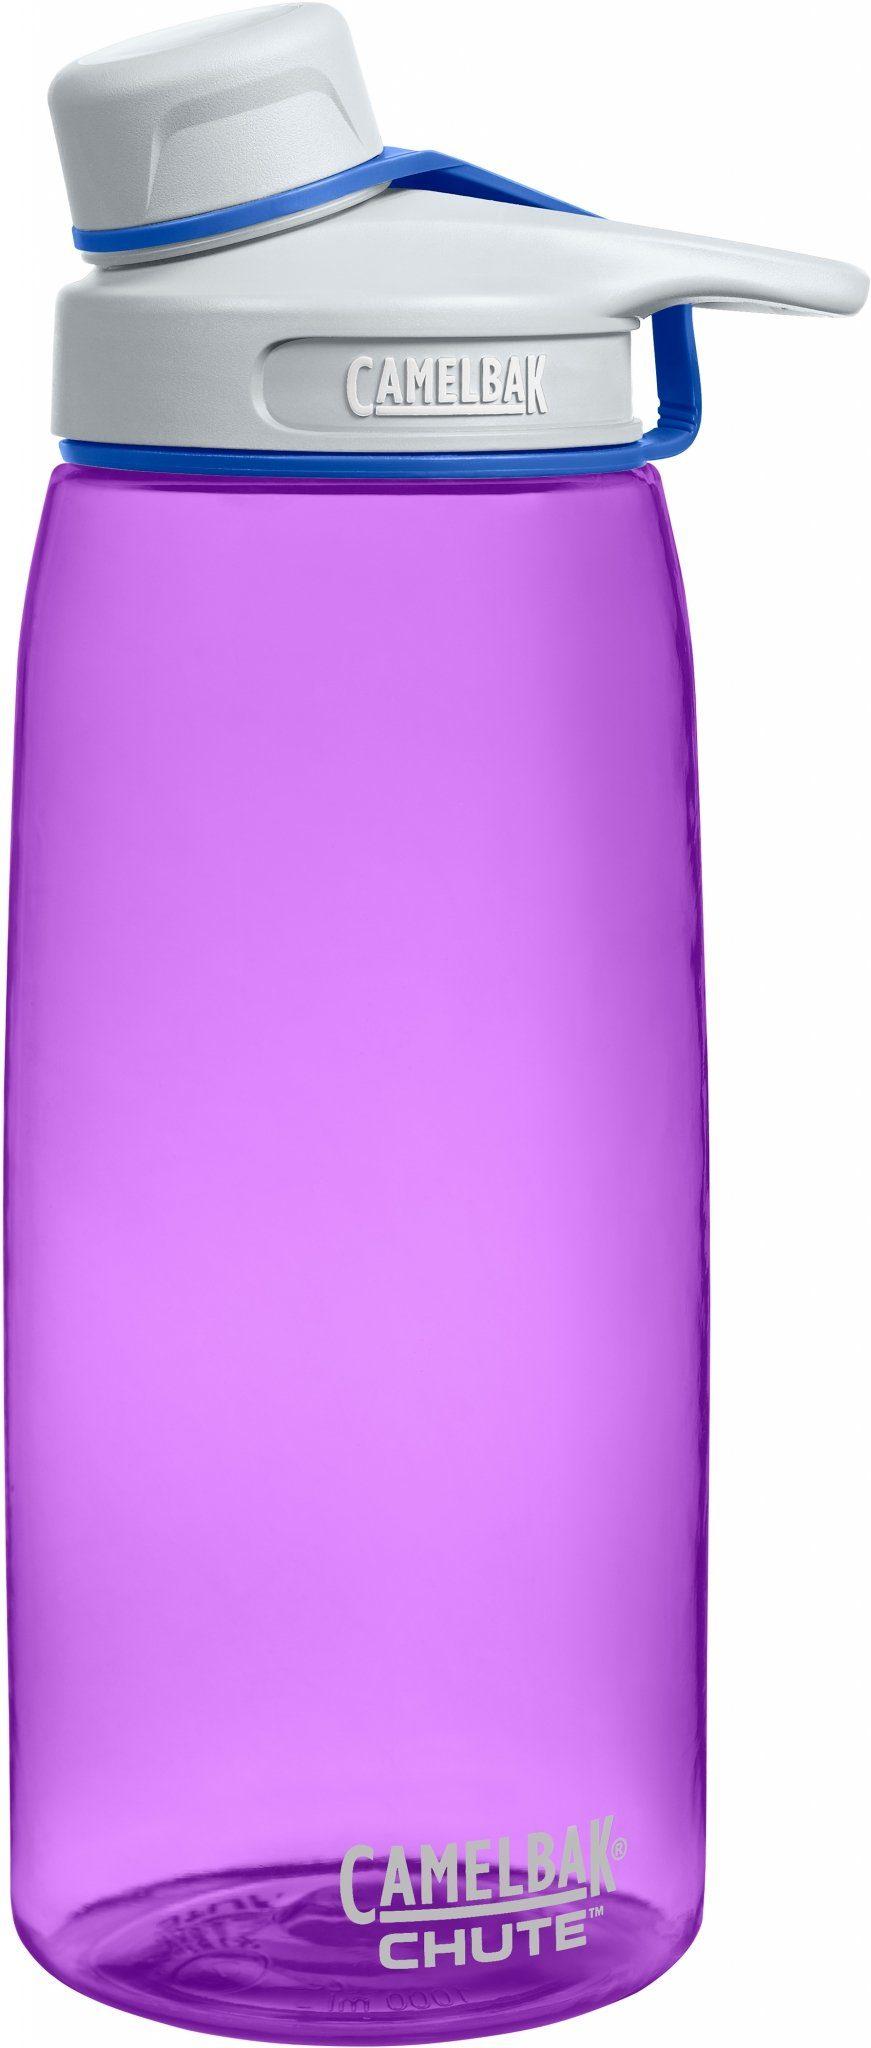 Camelbak Trinkflasche »Chute Trinkflasche 1000ml«